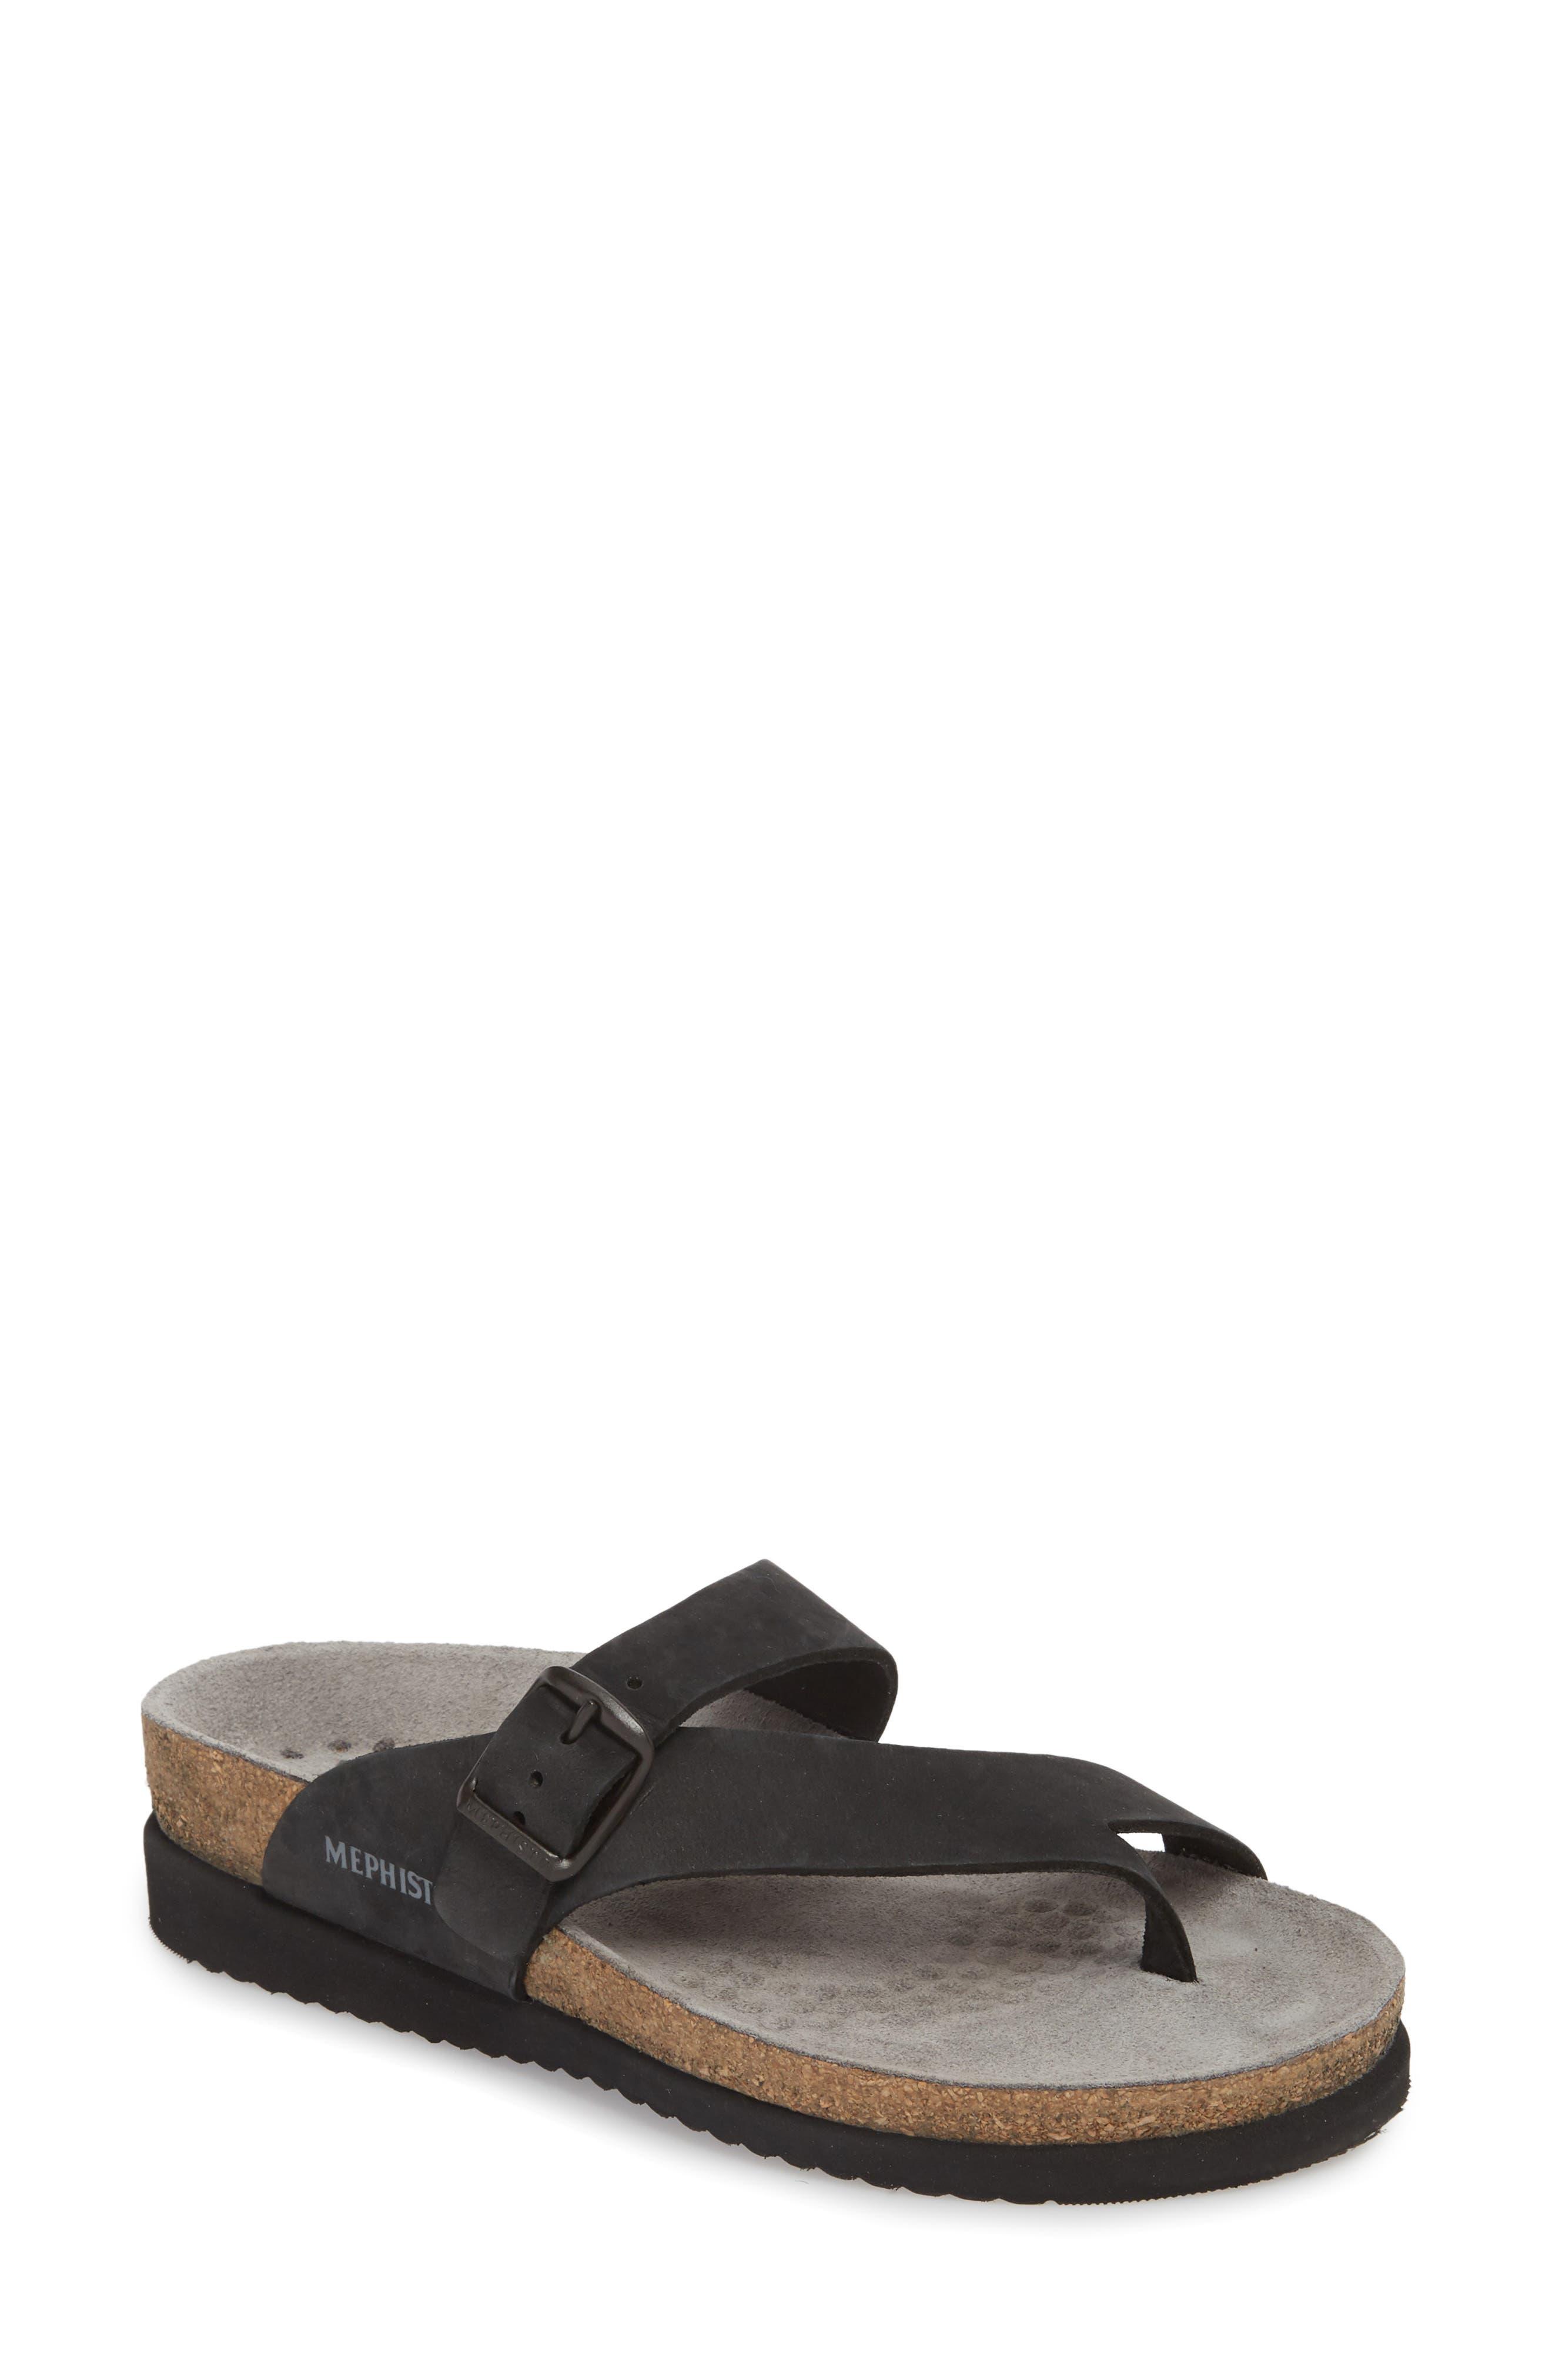 MEPHISTO, 'Helen' Sandal, Main thumbnail 1, color, BLACK NUBUCK